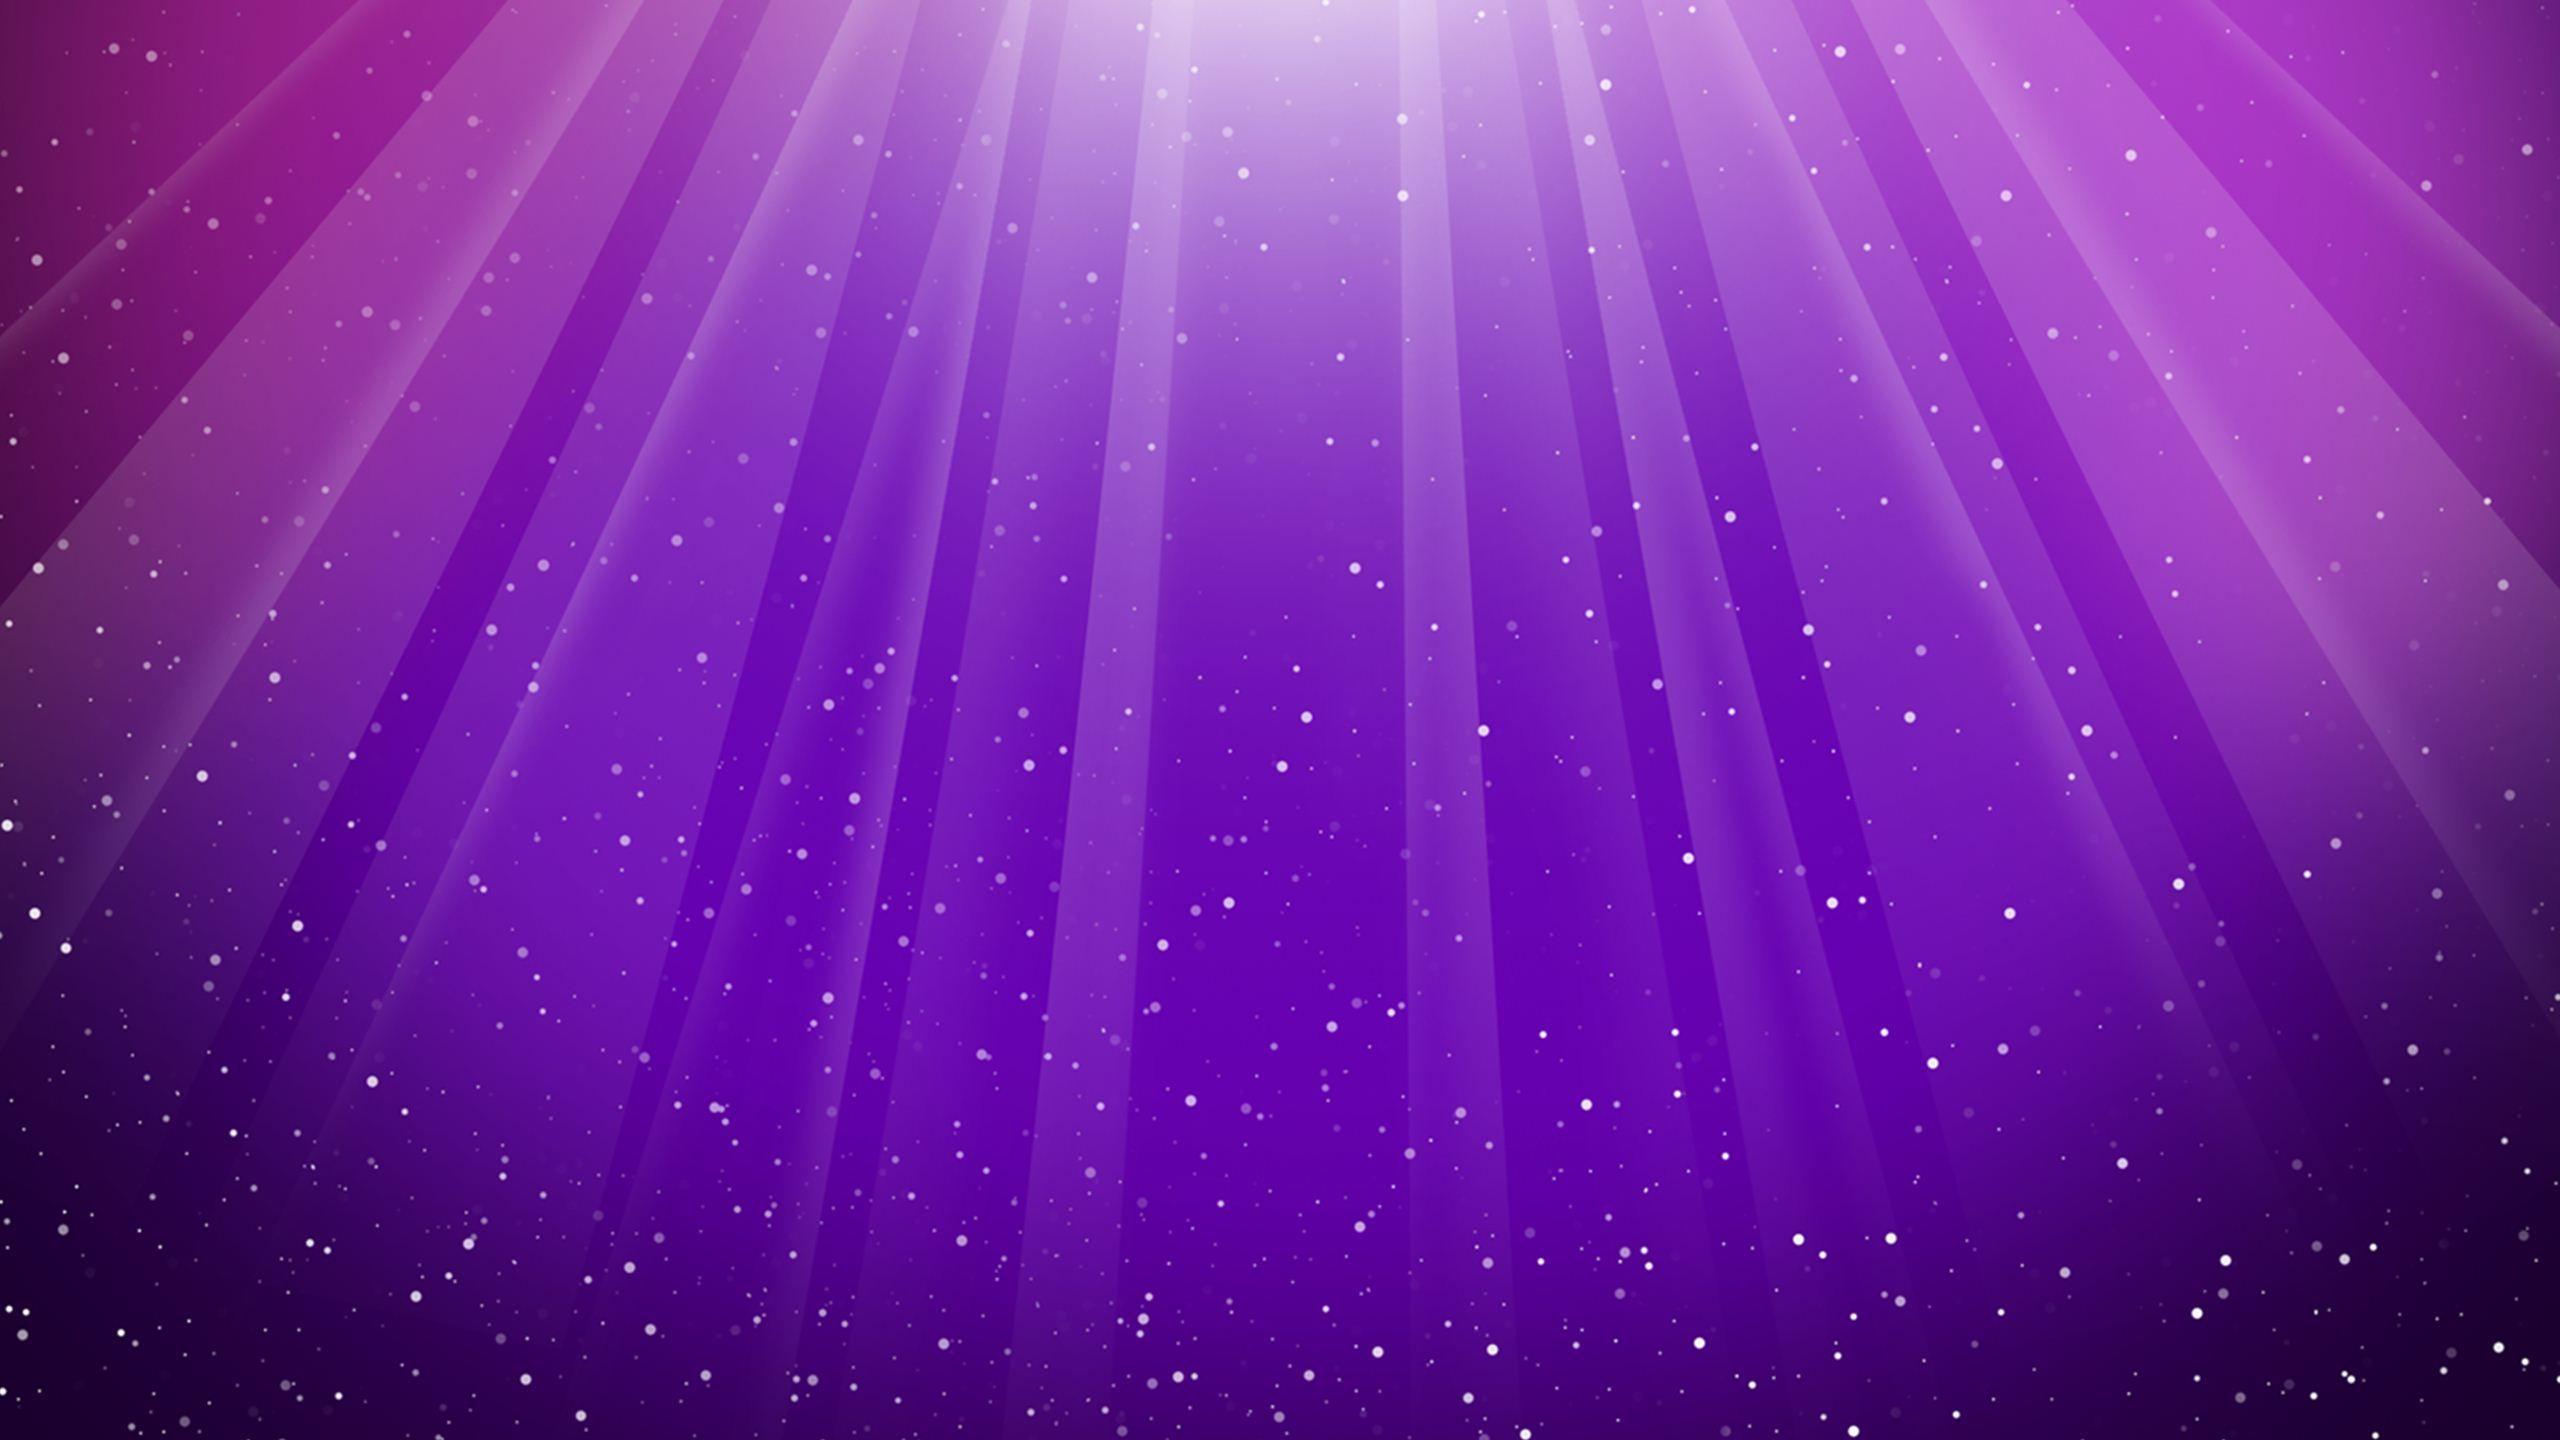 Purple Haze Background WallpaperSafari